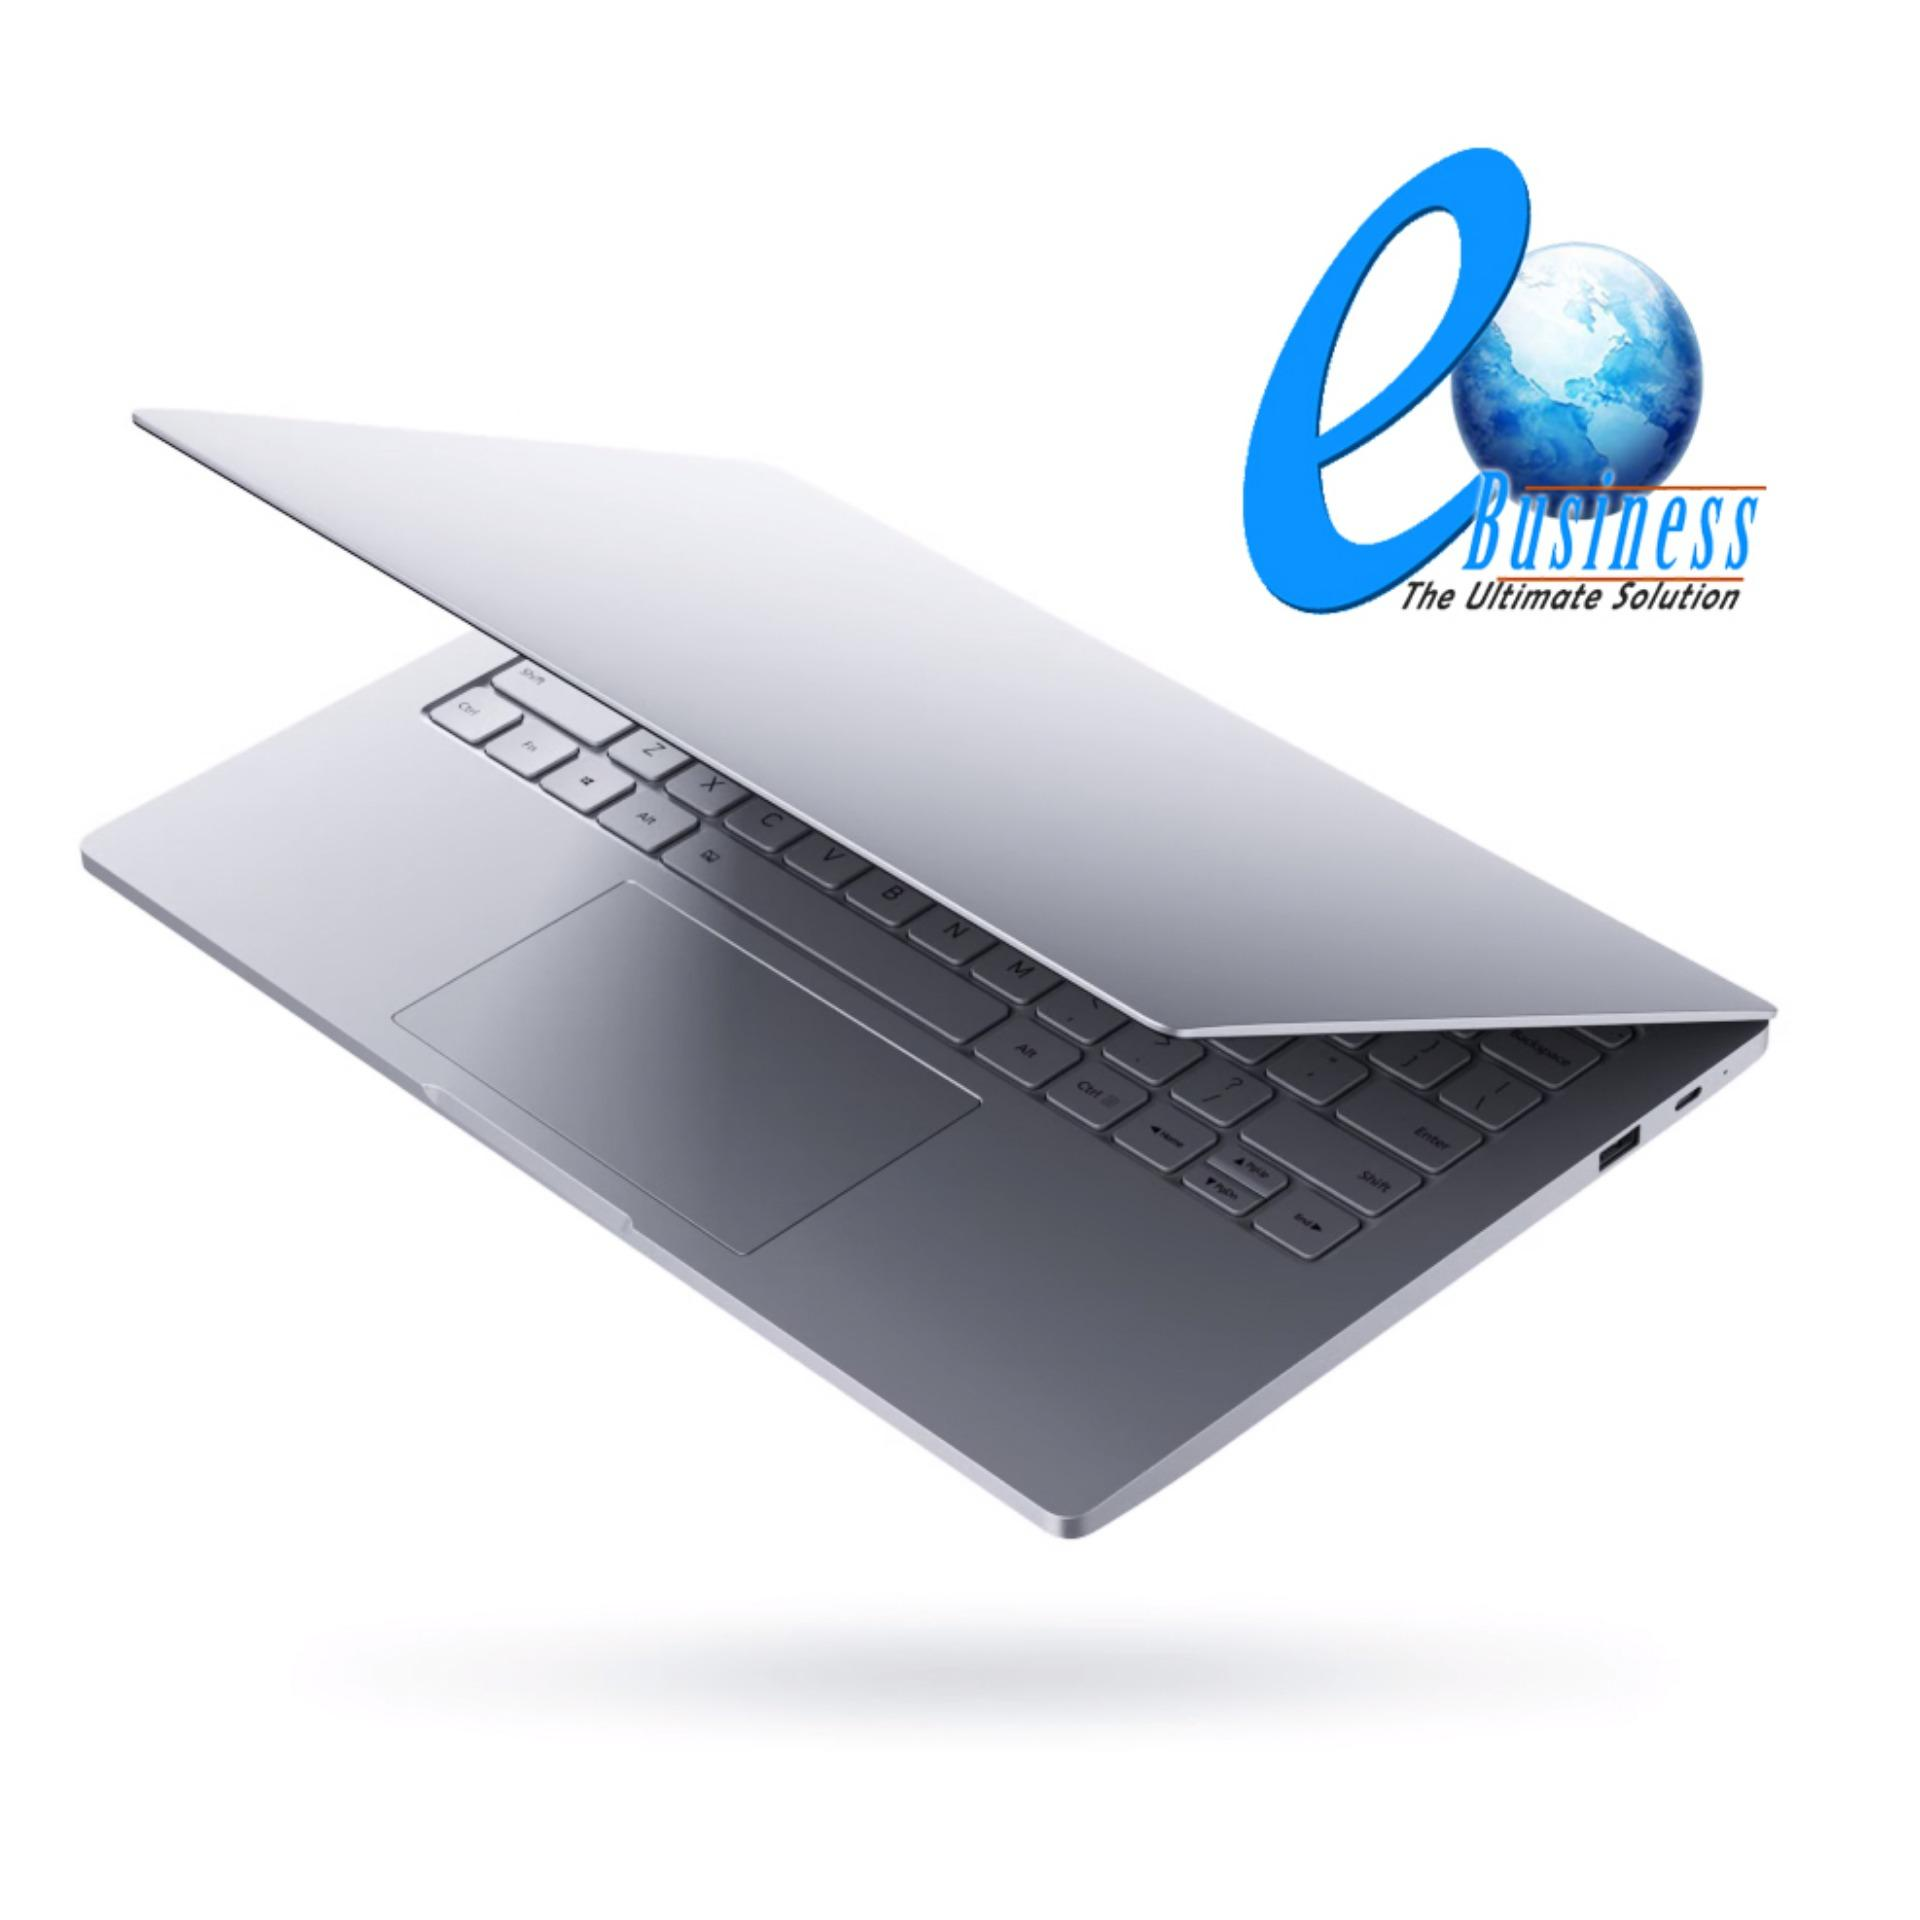 Xiaomi Mi Air Notebook Laptop 12.5 inch Export